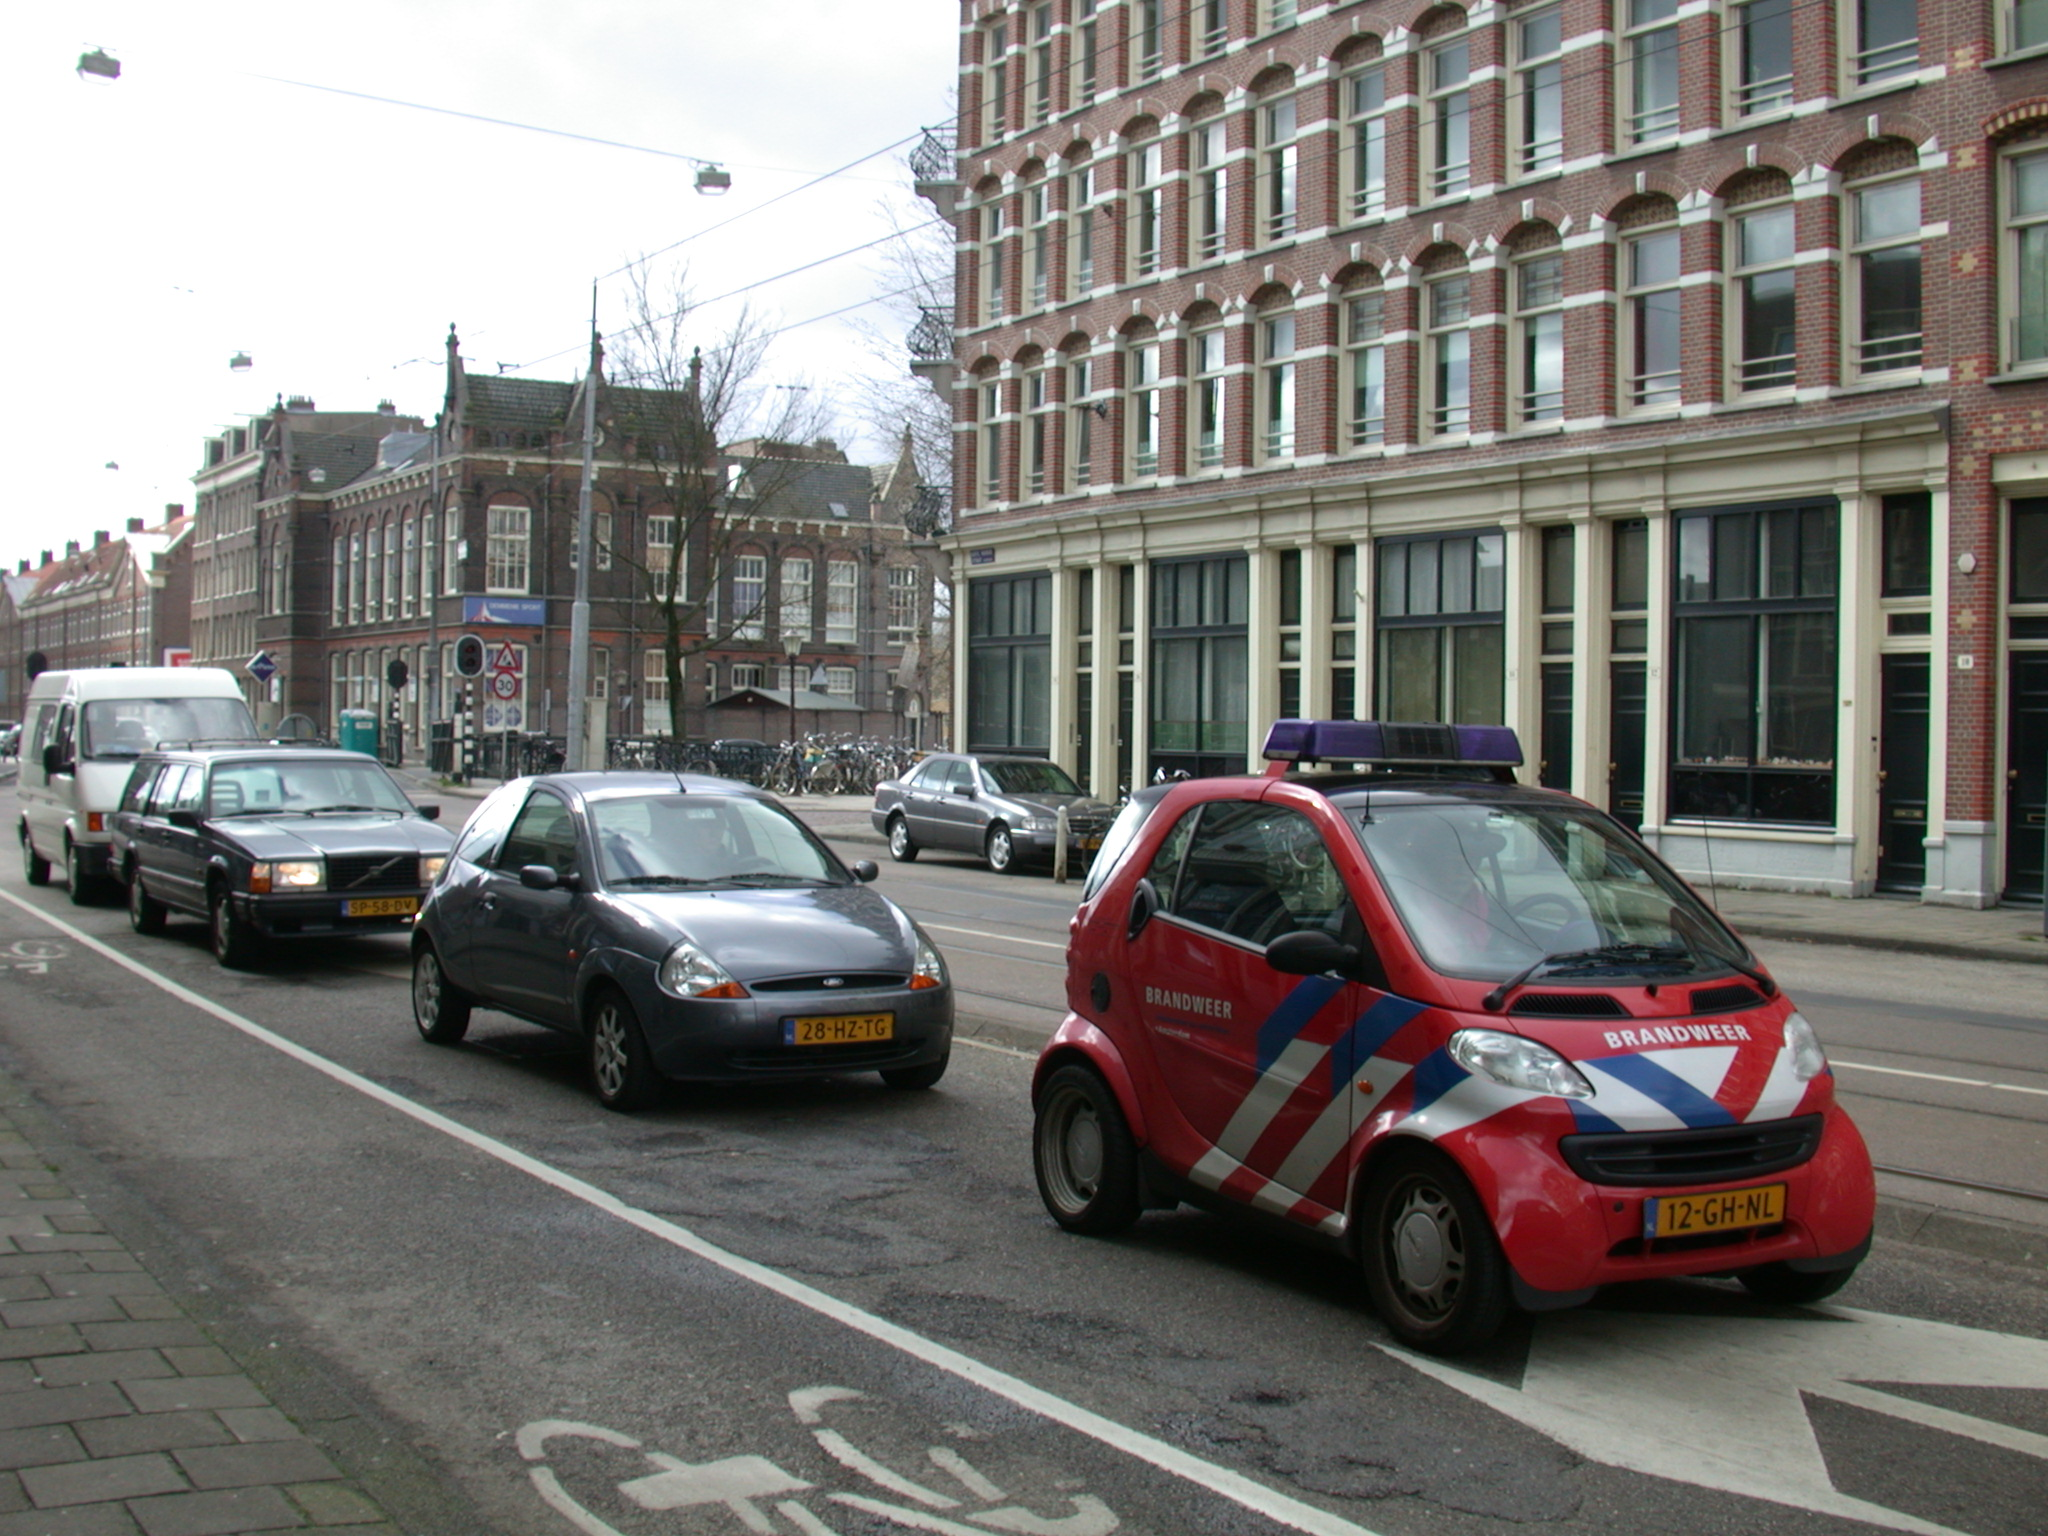 car cars red stripes waiting in line traffic lights brandweer smart kia